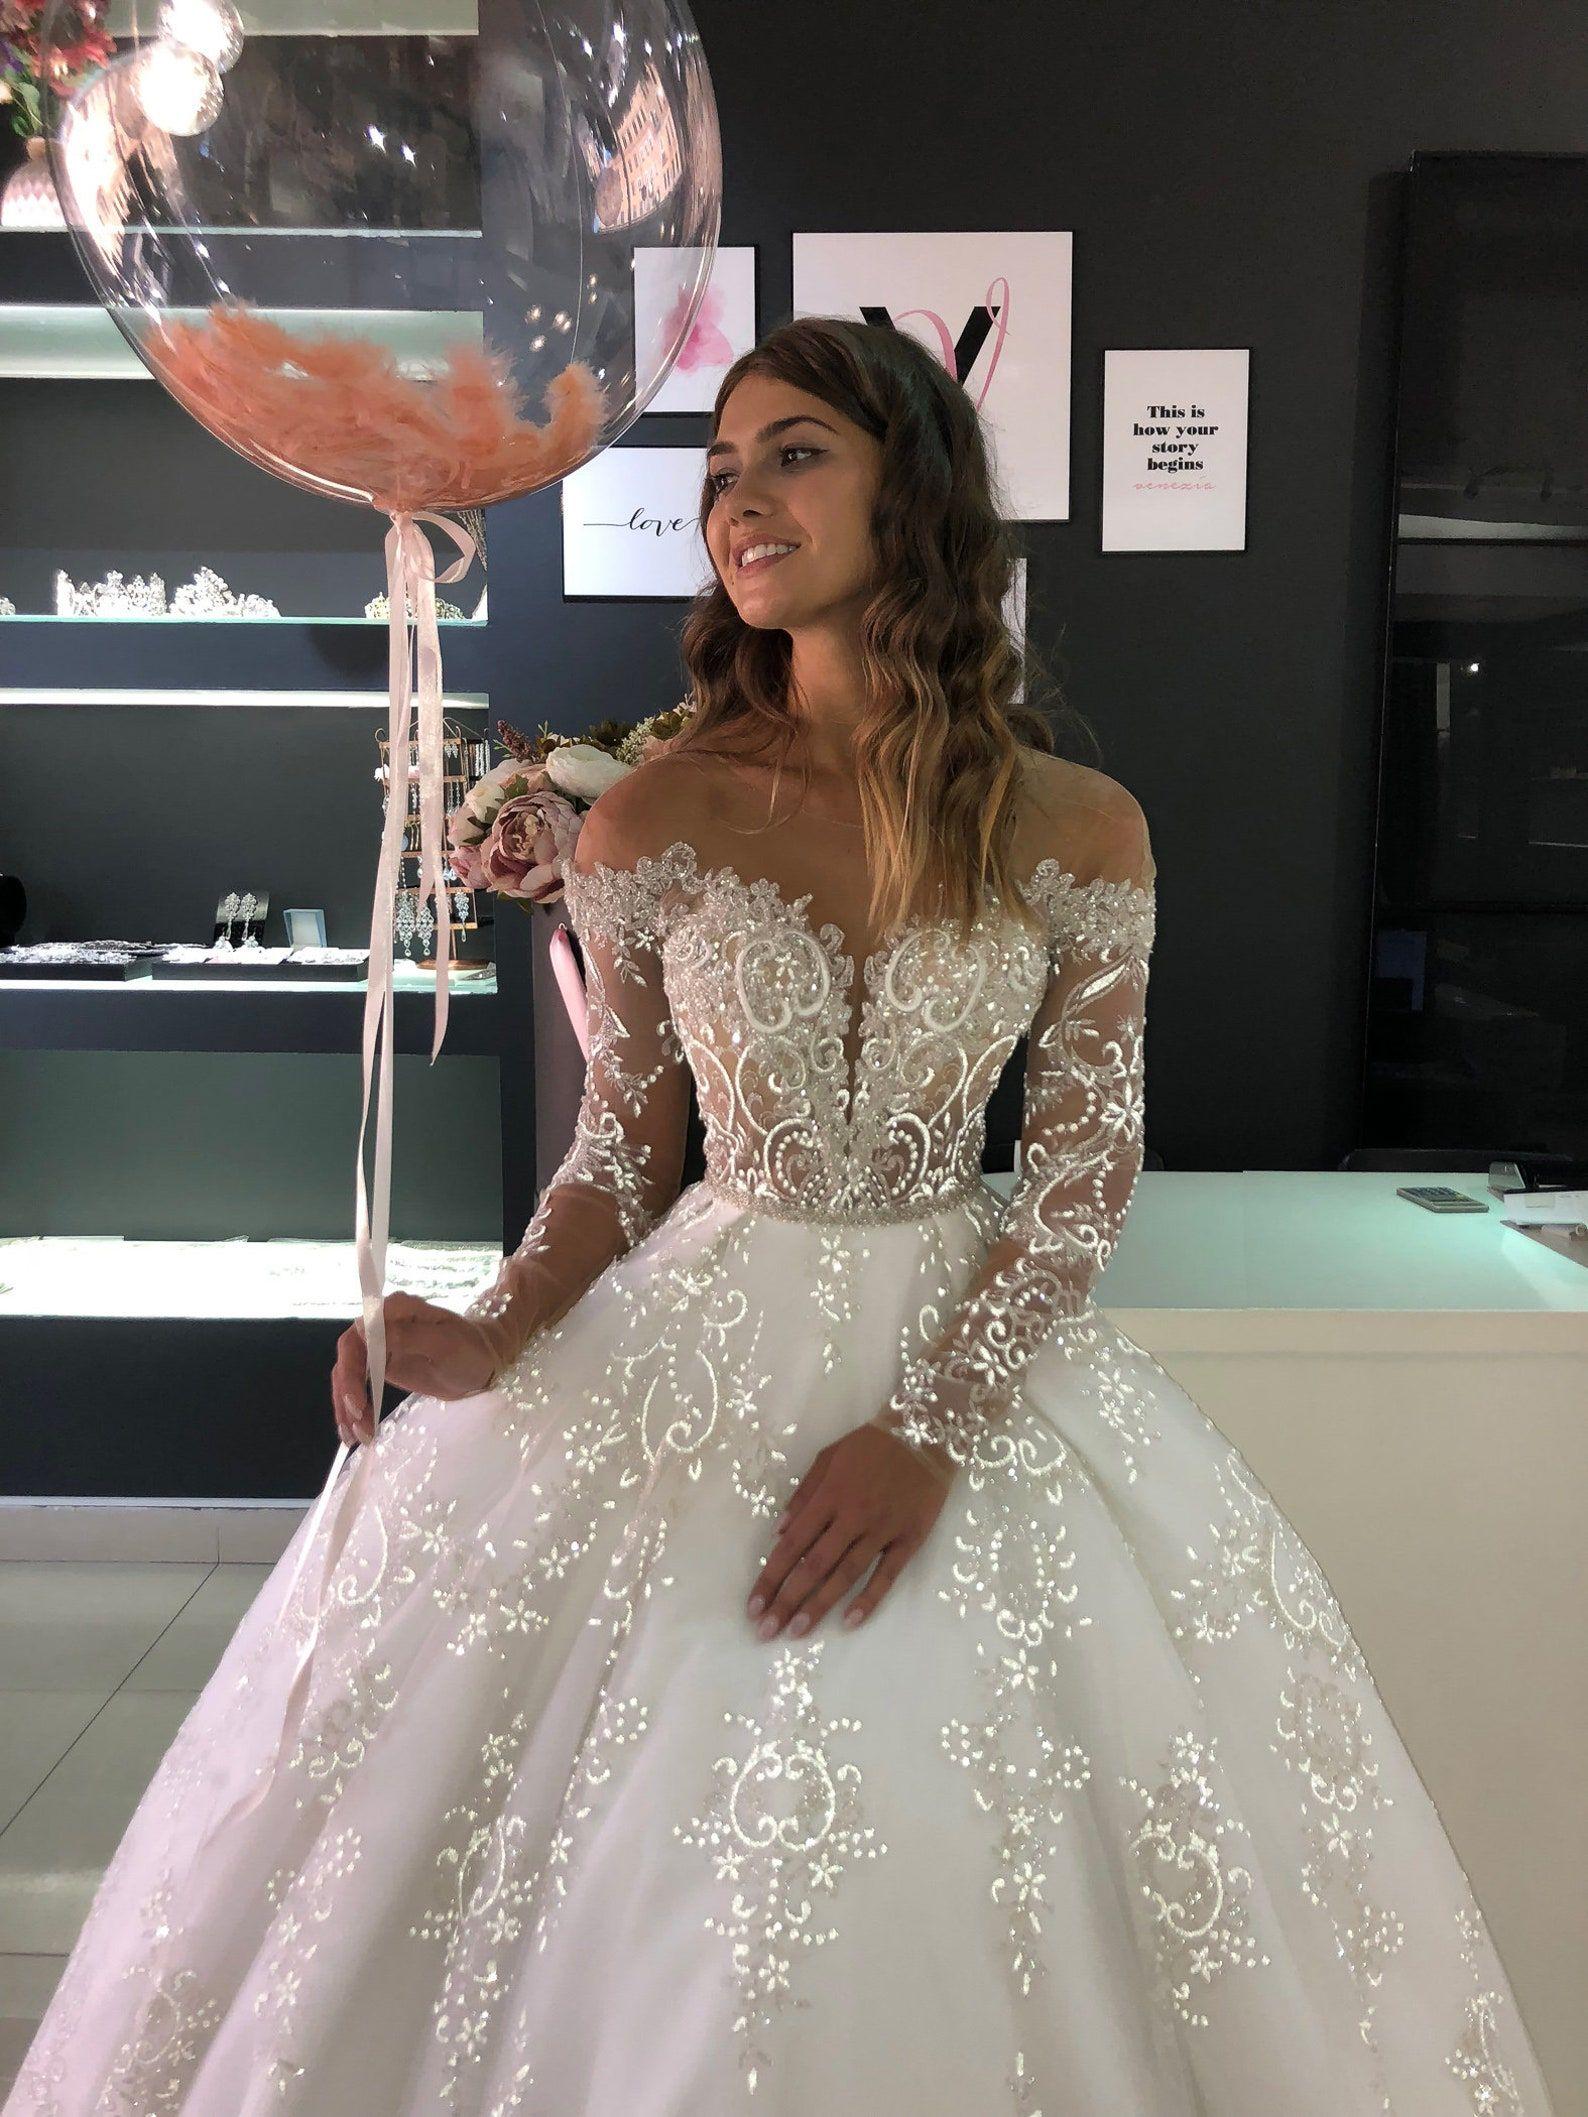 Batist By Olivia Bottega Full Skirt Glittered Wedding Dress Wedding Gown With Glitter Sparkling Wedding Dress Fairy Tale Wedding In 2021 Sparkle Wedding Dress Pretty Wedding Dresses Wedding Dress Long Sleeve [ 2117 x 1588 Pixel ]